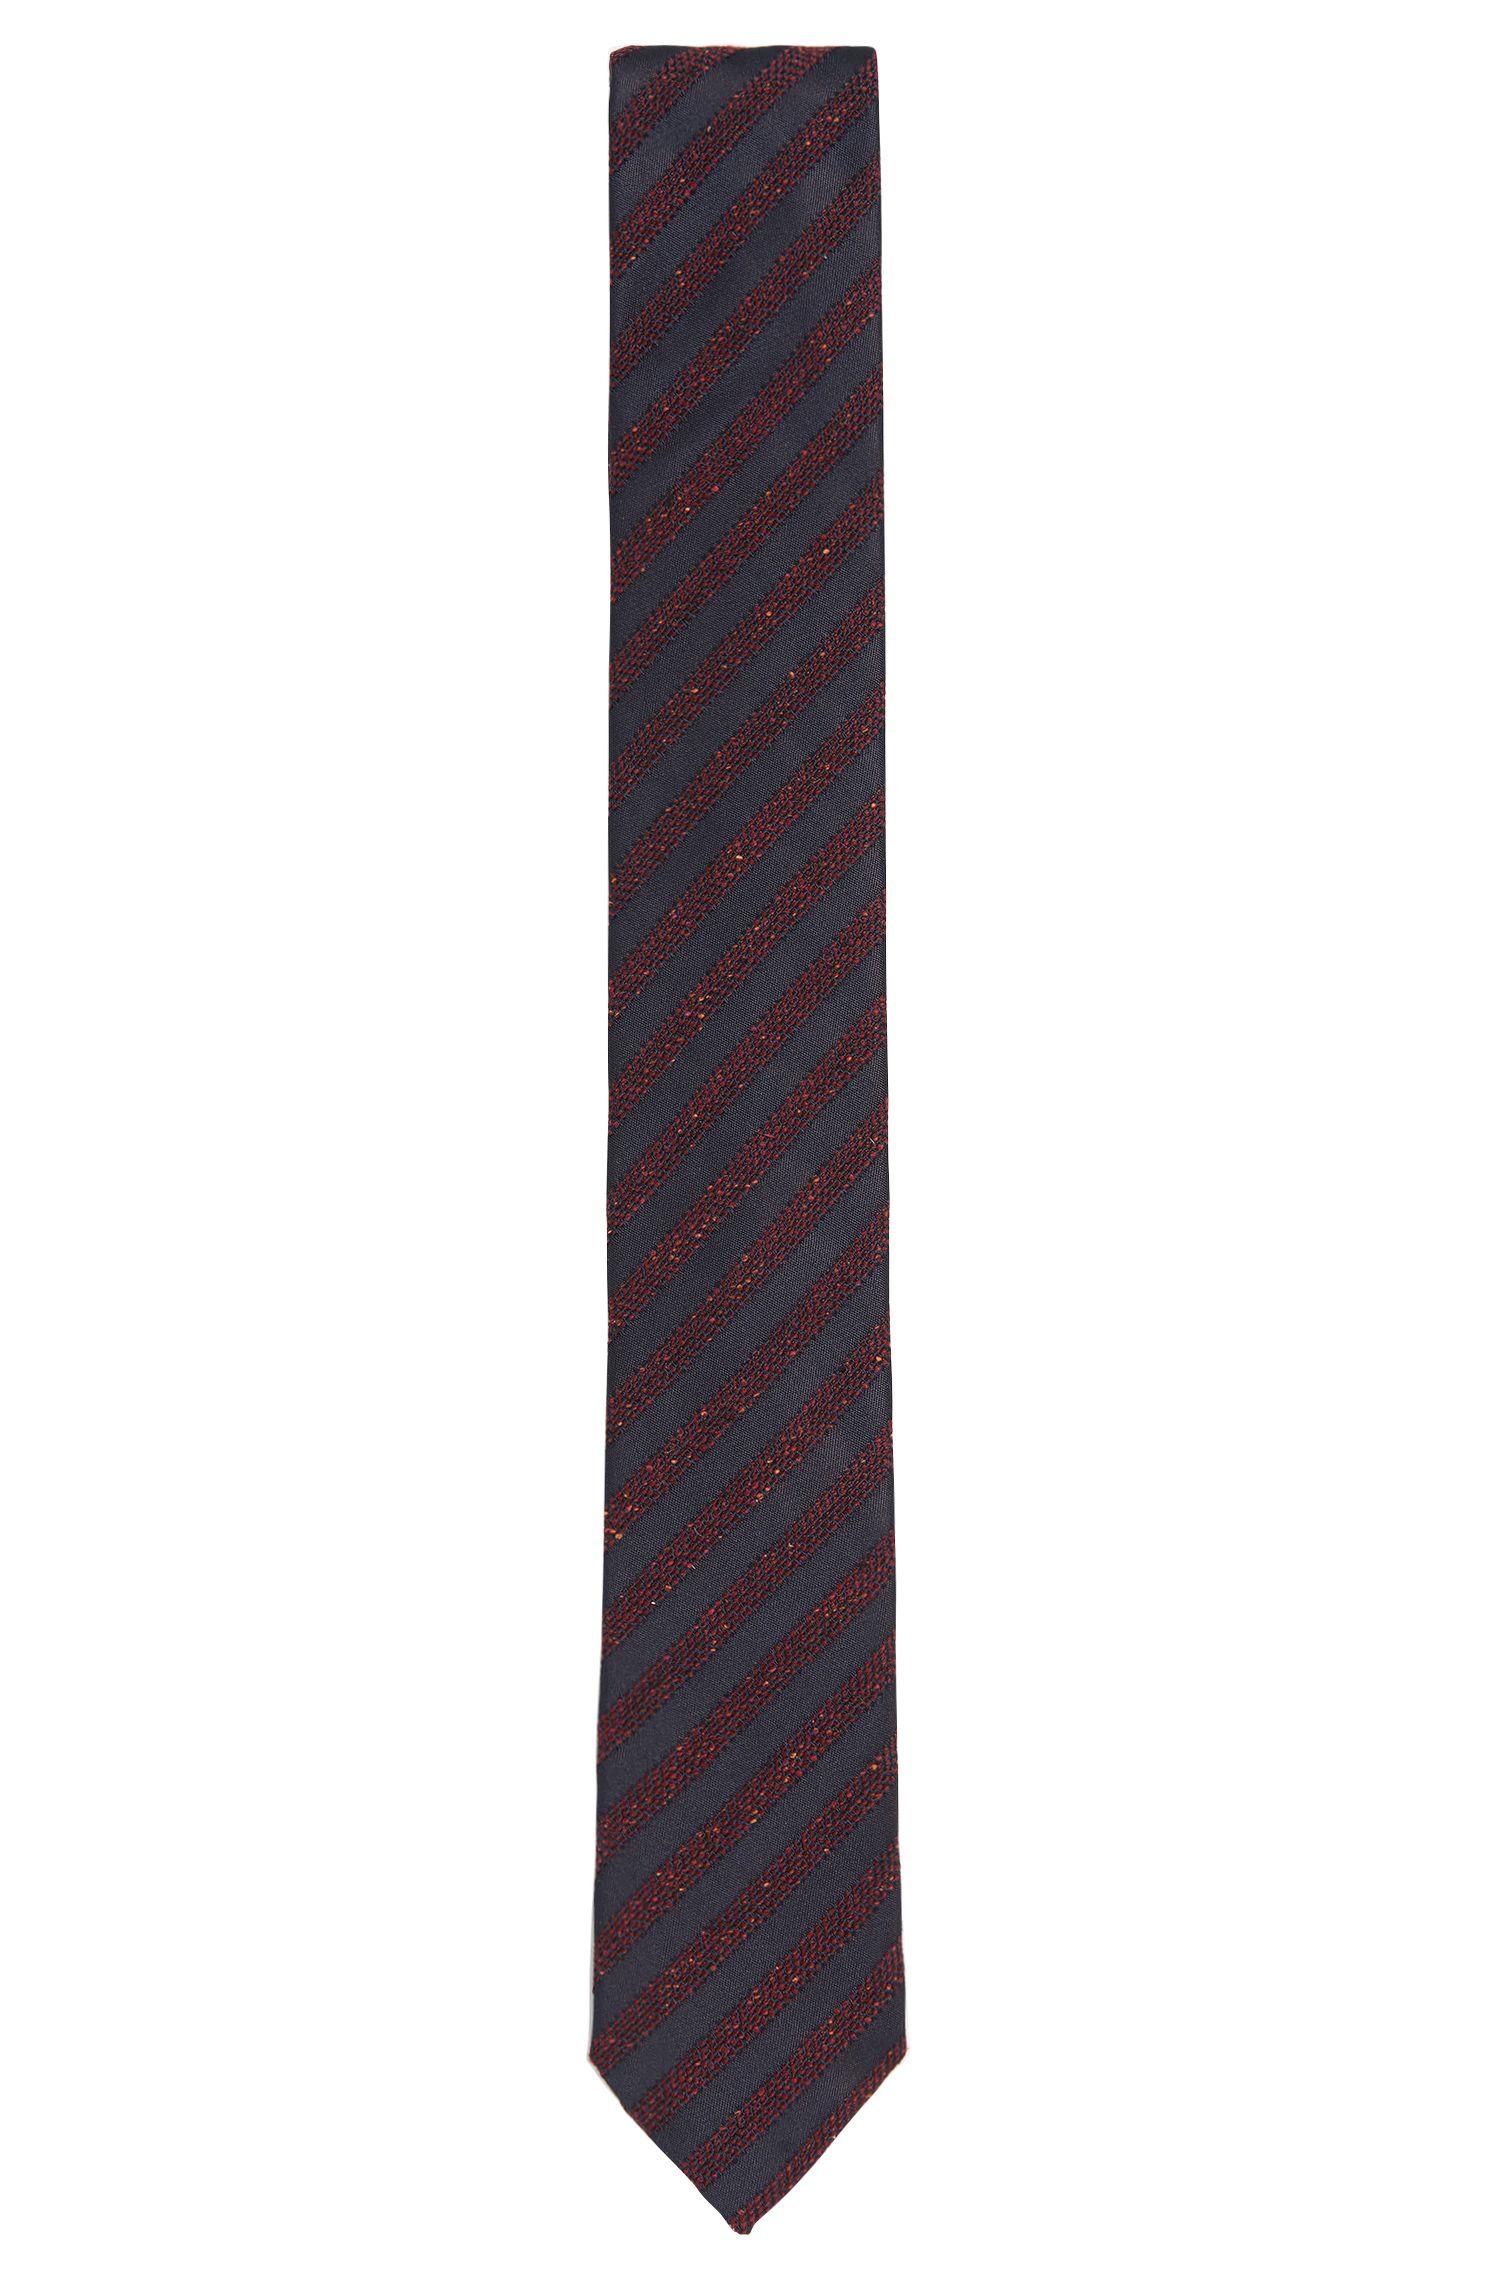 'Tie 6 cm' | Slim, Italian Silk Wool Blend Woven Tie